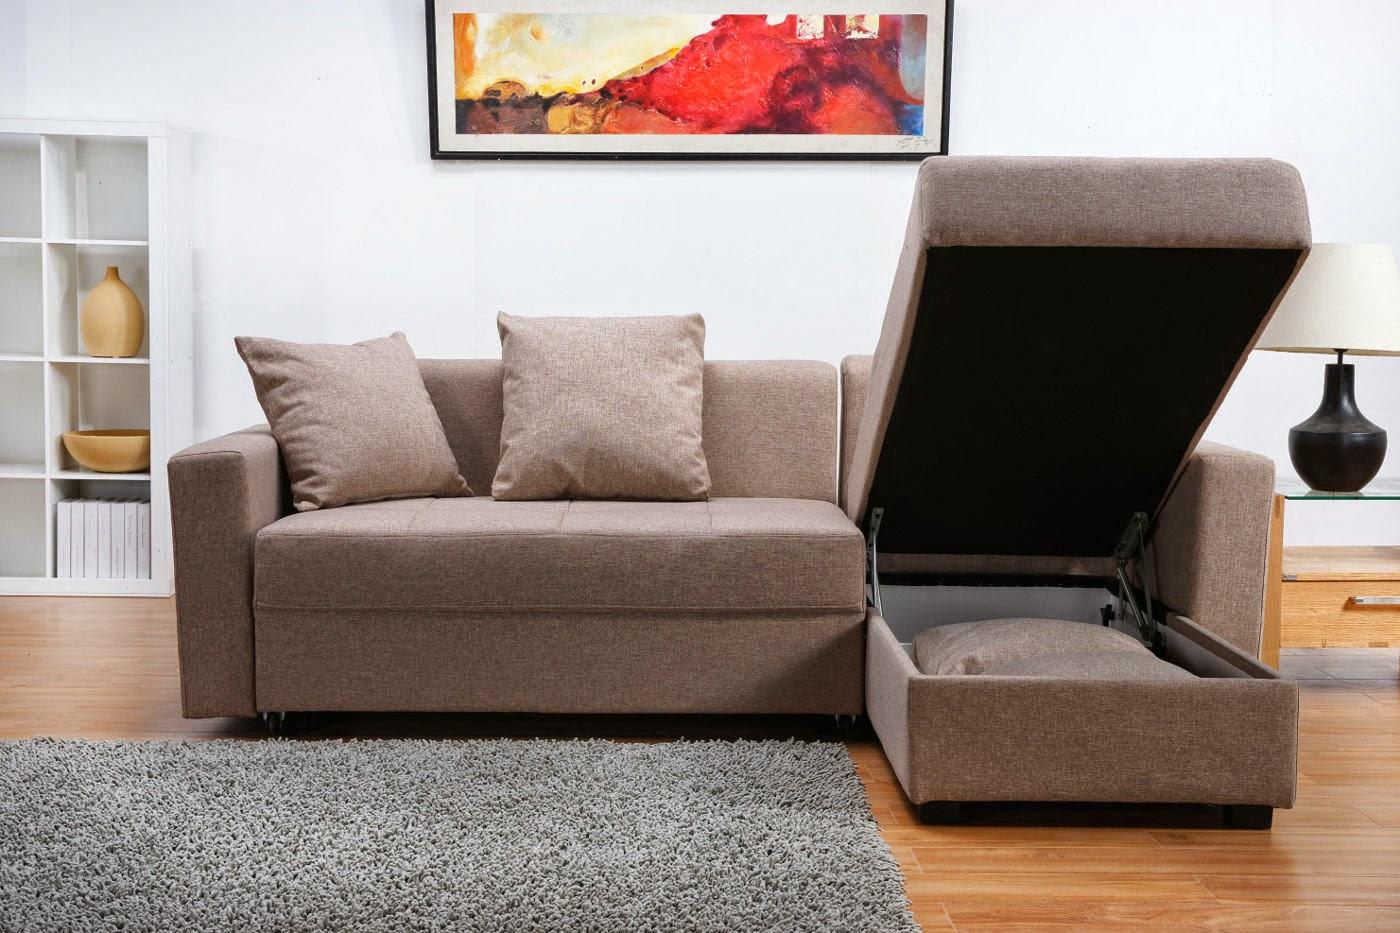 jual sofa bed murah di jakarta selatan small modern harga cover bandung